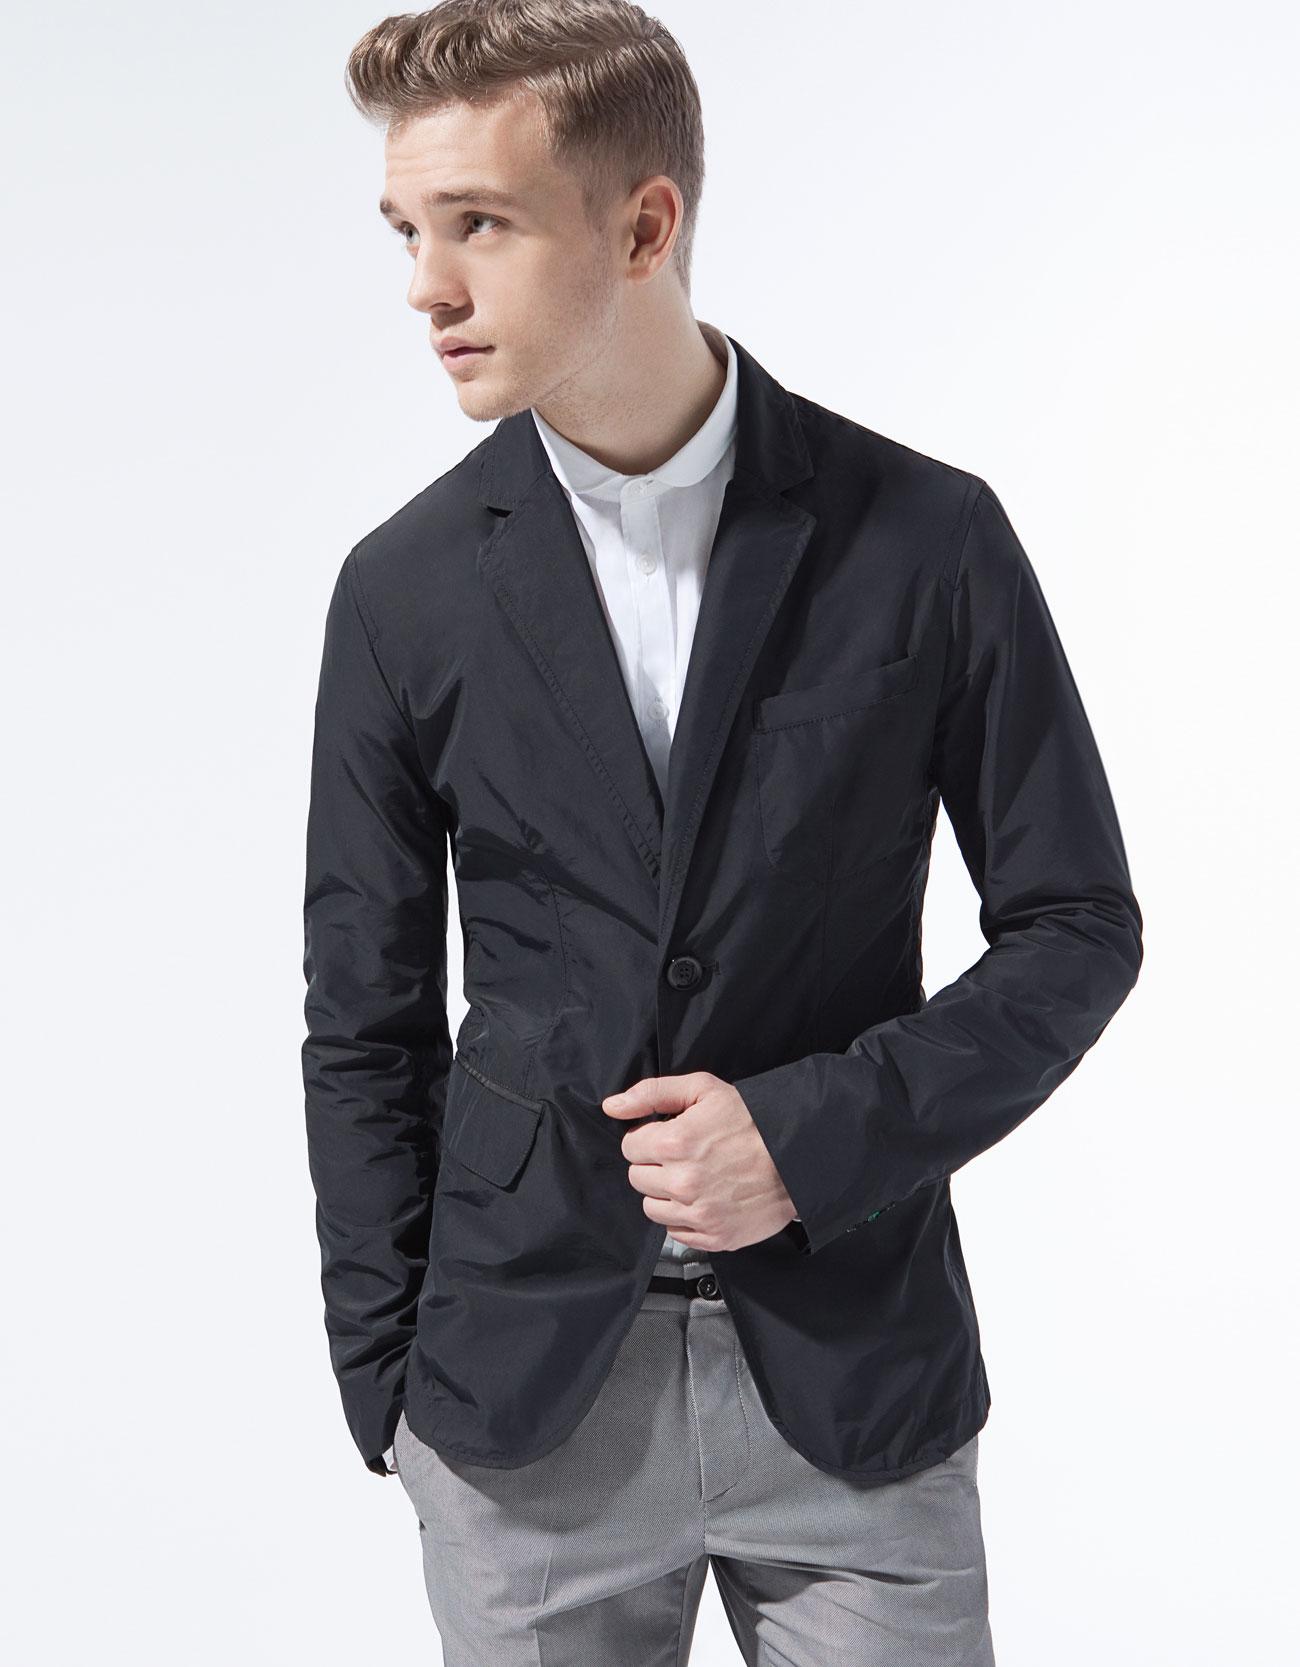 Zara Club Collar Shirt In Black For Men | Lyst